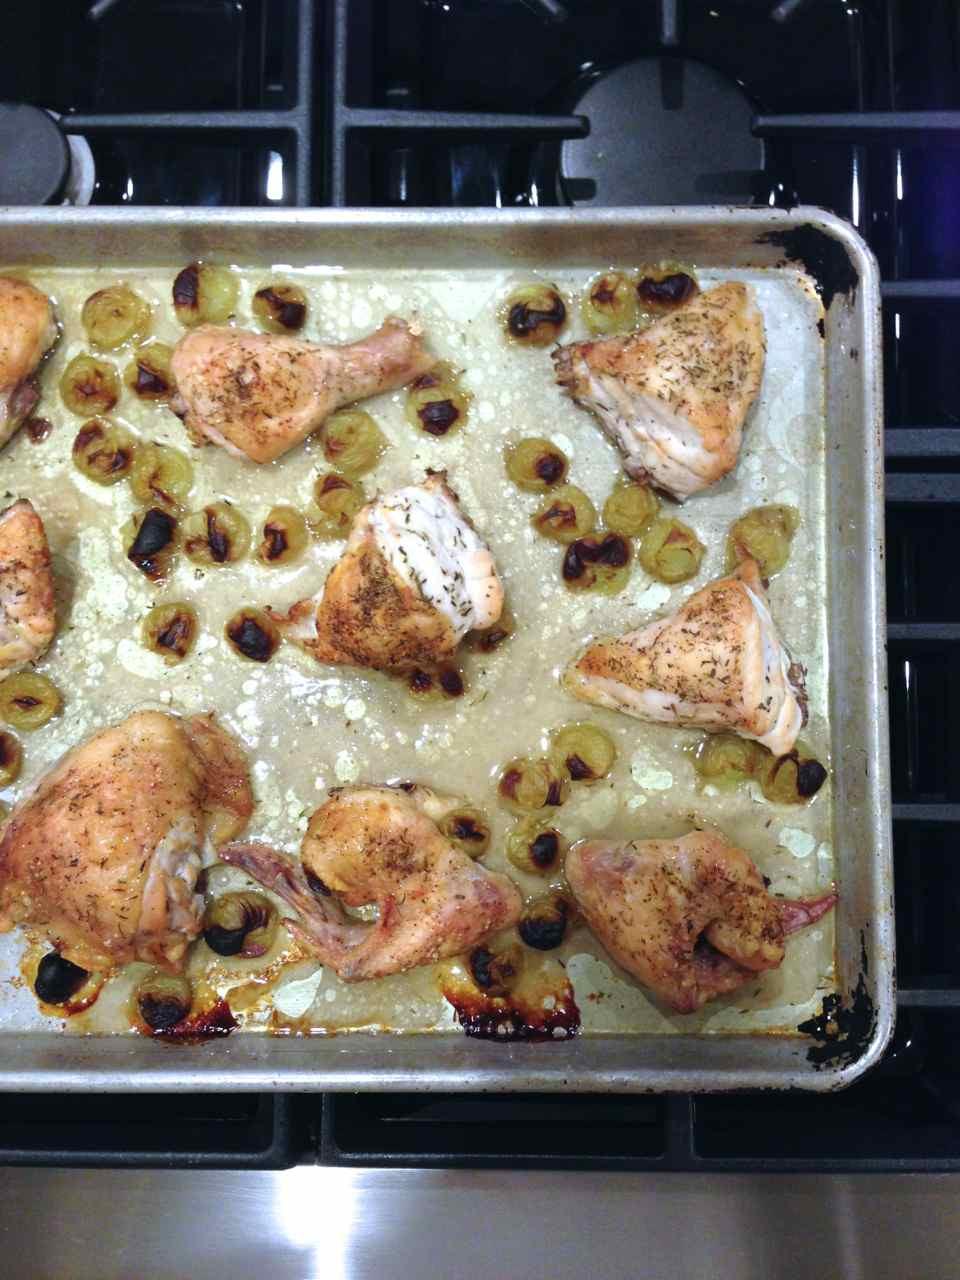 Thyme Chicken Grapes_Acorn Squash c2014 TRC 6.jpg